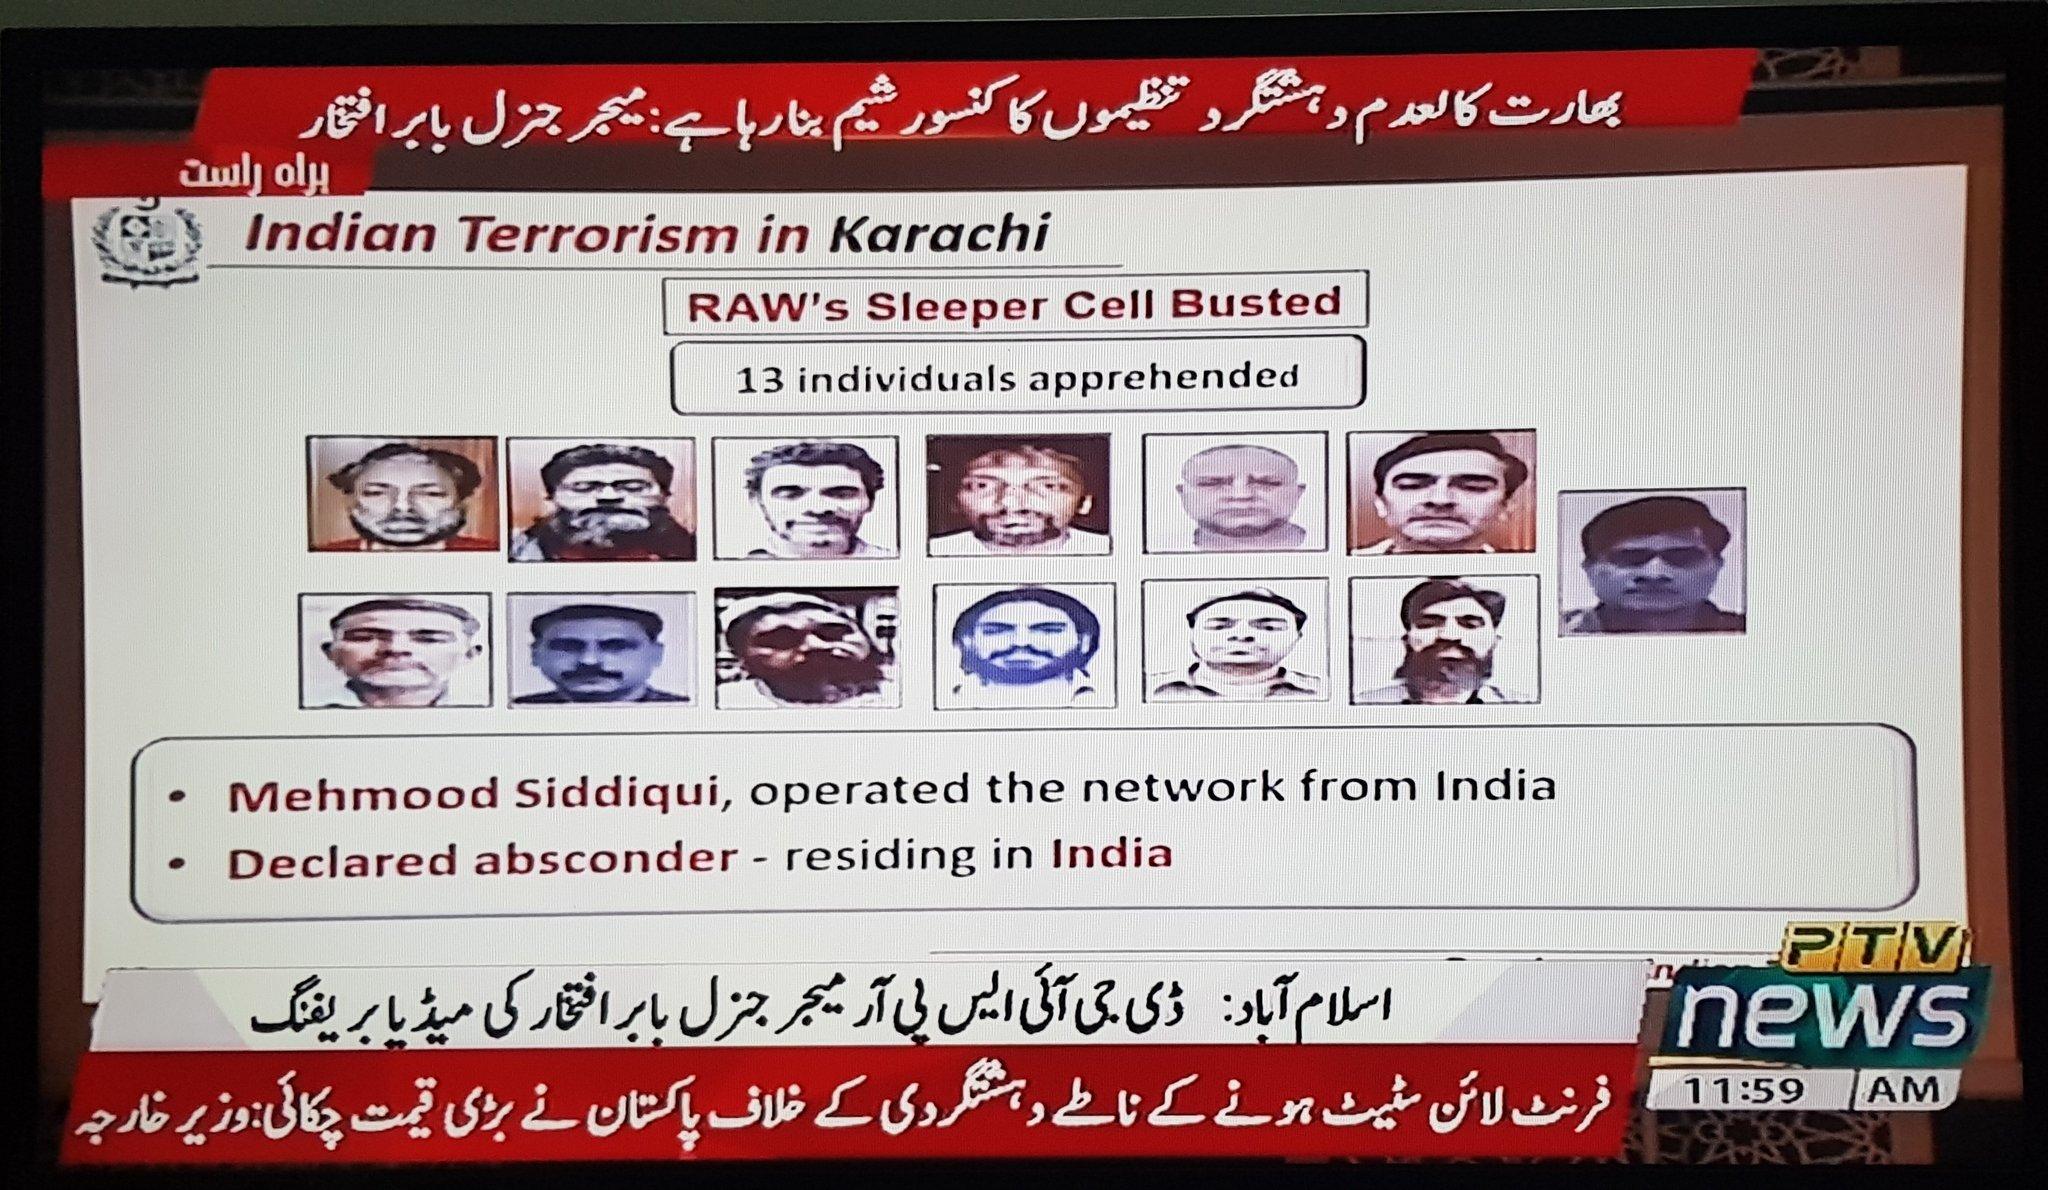 pakistan dossier on indian terrorism